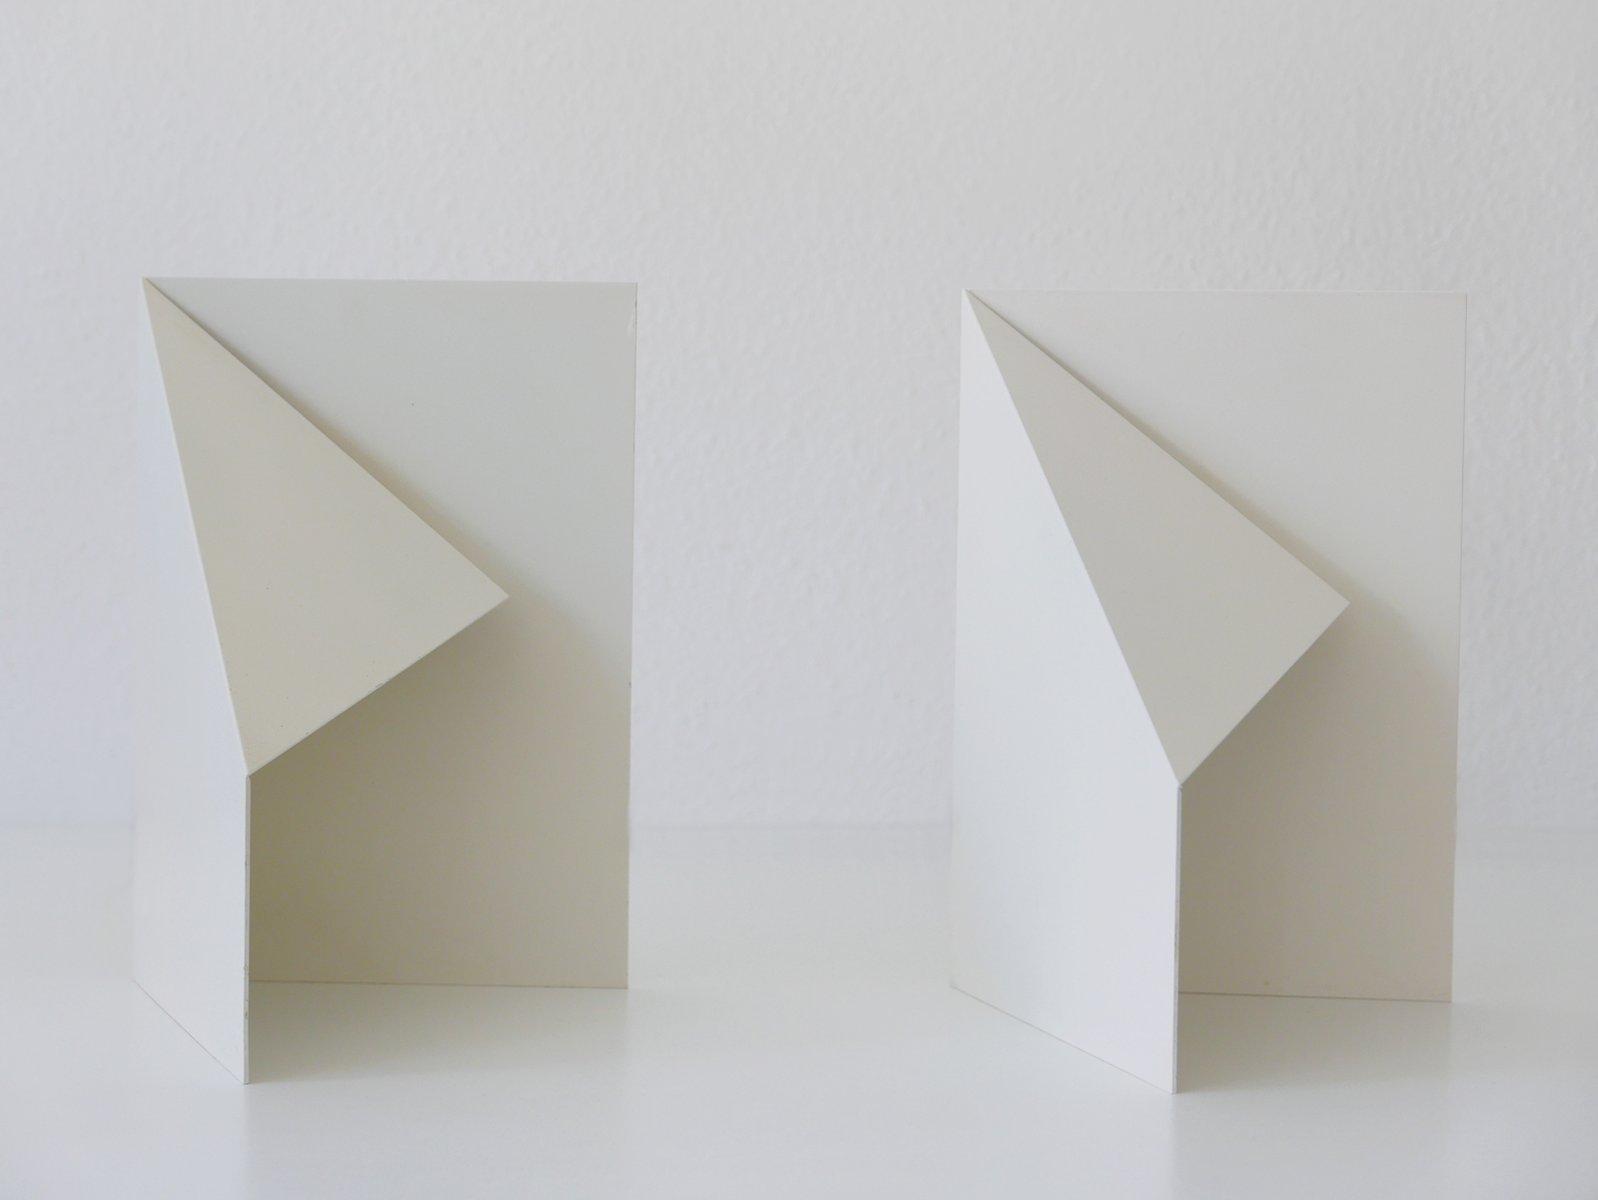 Mid-Century Origami Design Beistelltischlampen, 1970er, 2er Set